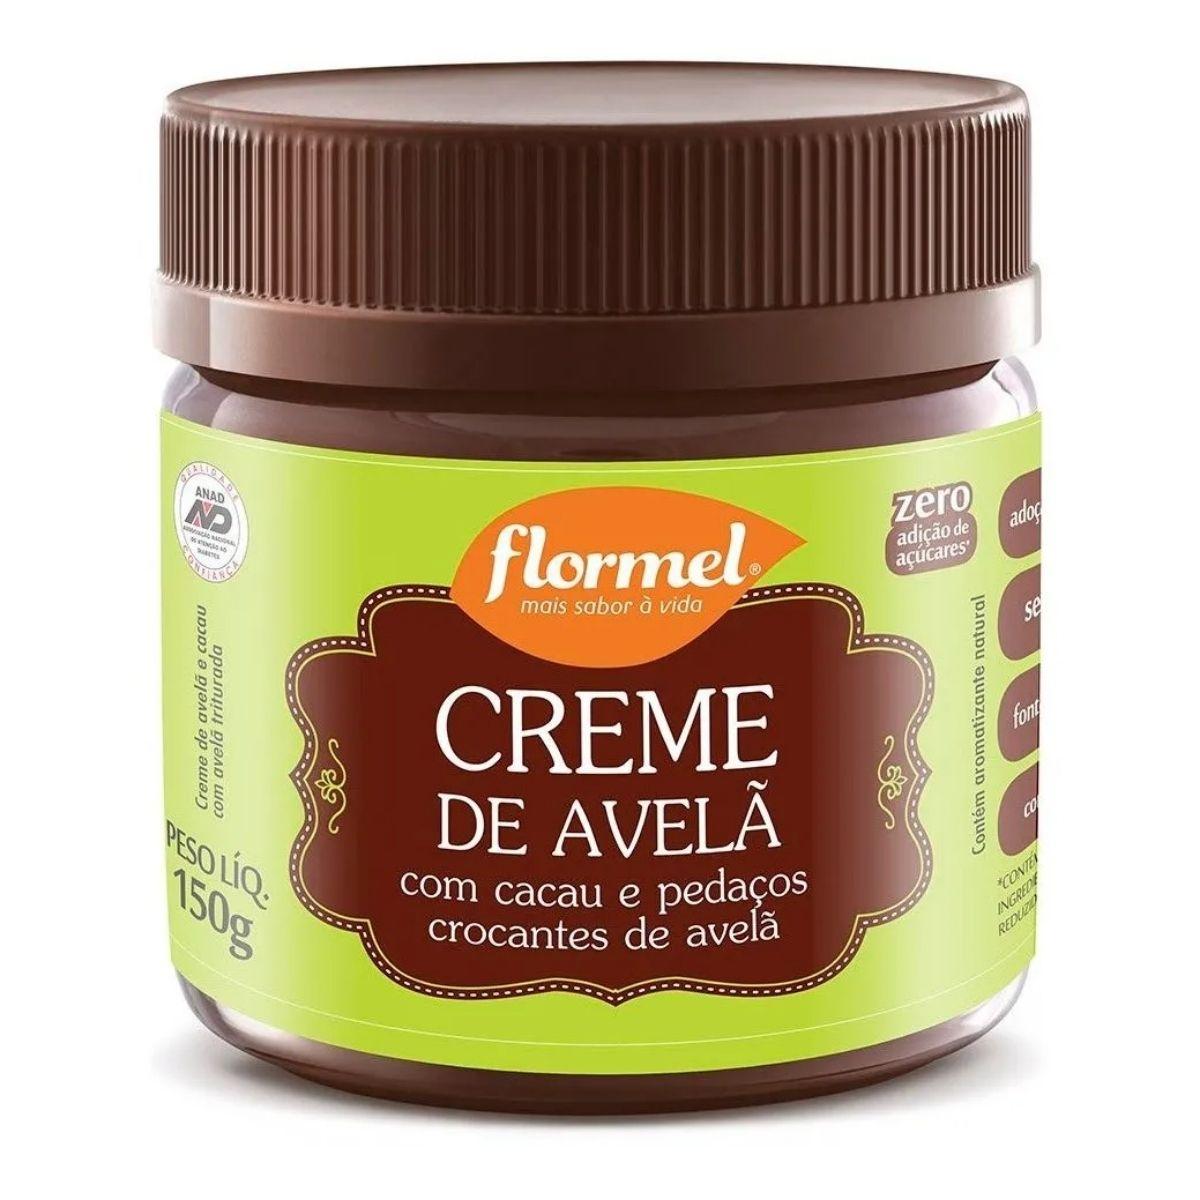 Creme de Avelã Crocante Zero 150g - Flormel